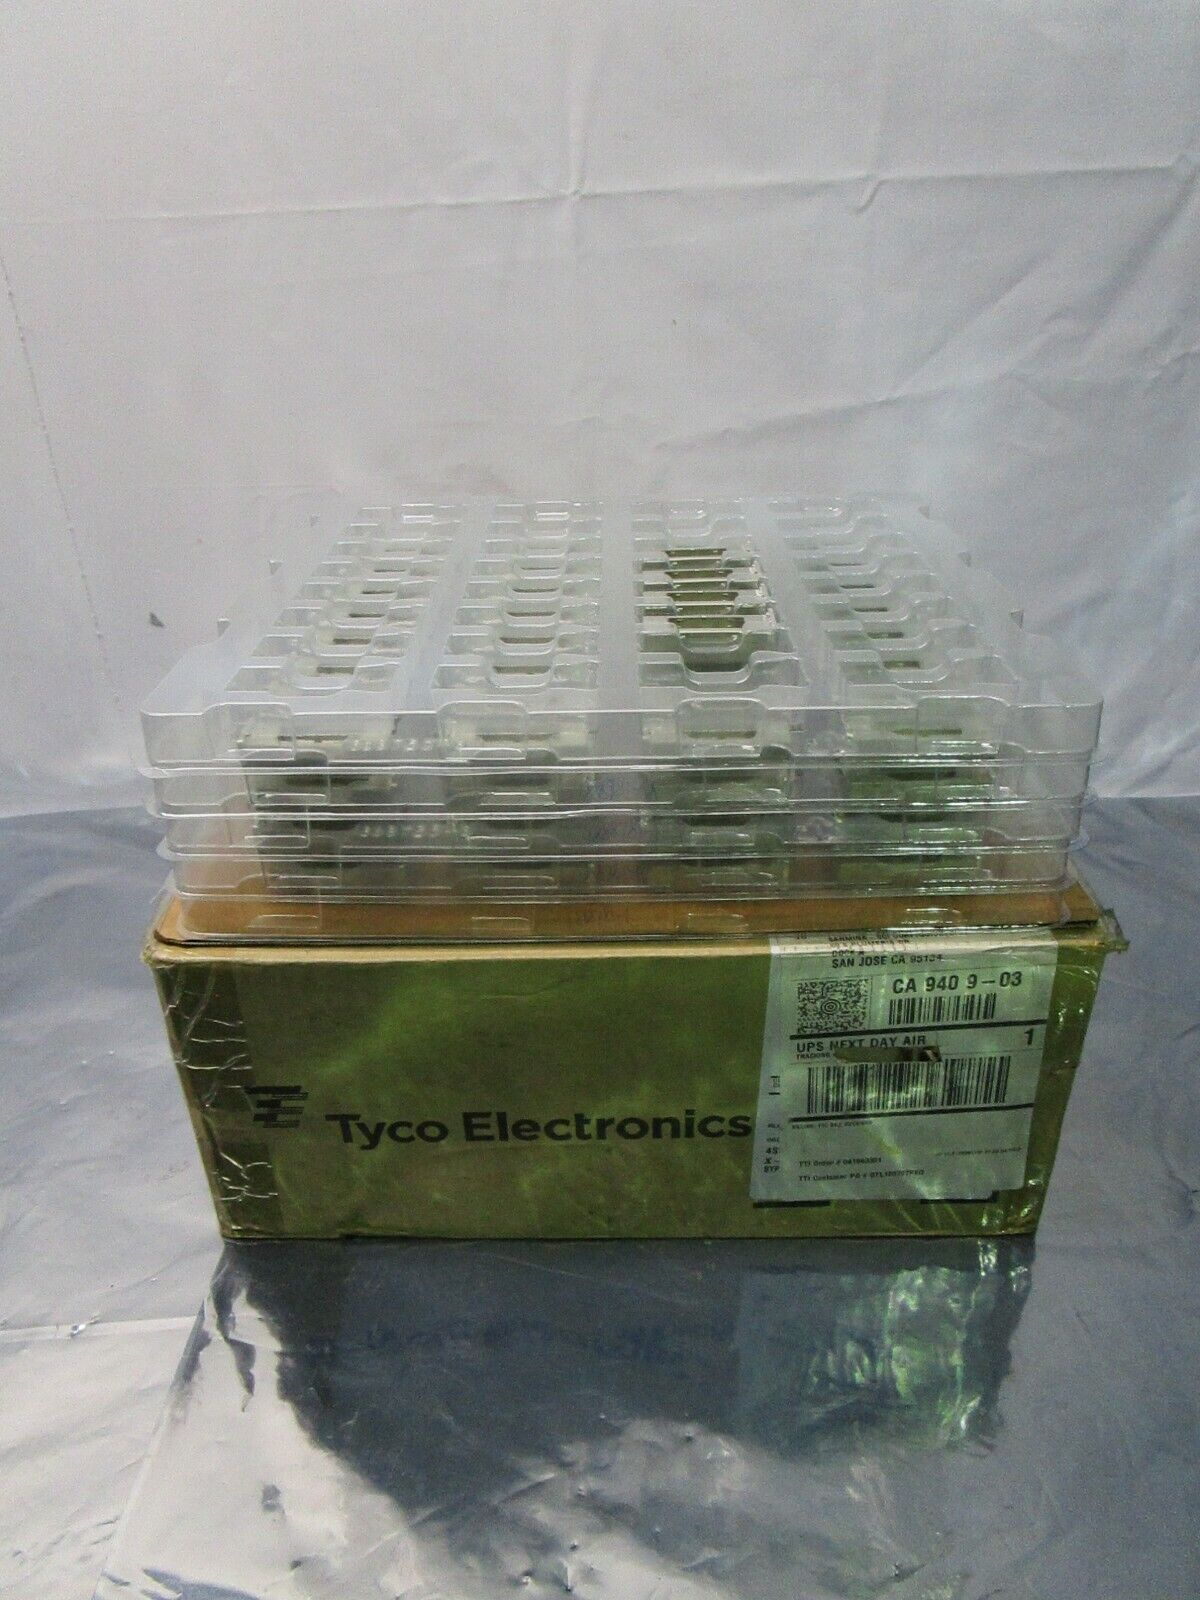 1 Lot of 132 TE Connectivity 1888781-1 I/O Connectors Cage Assy QSFP, 102357